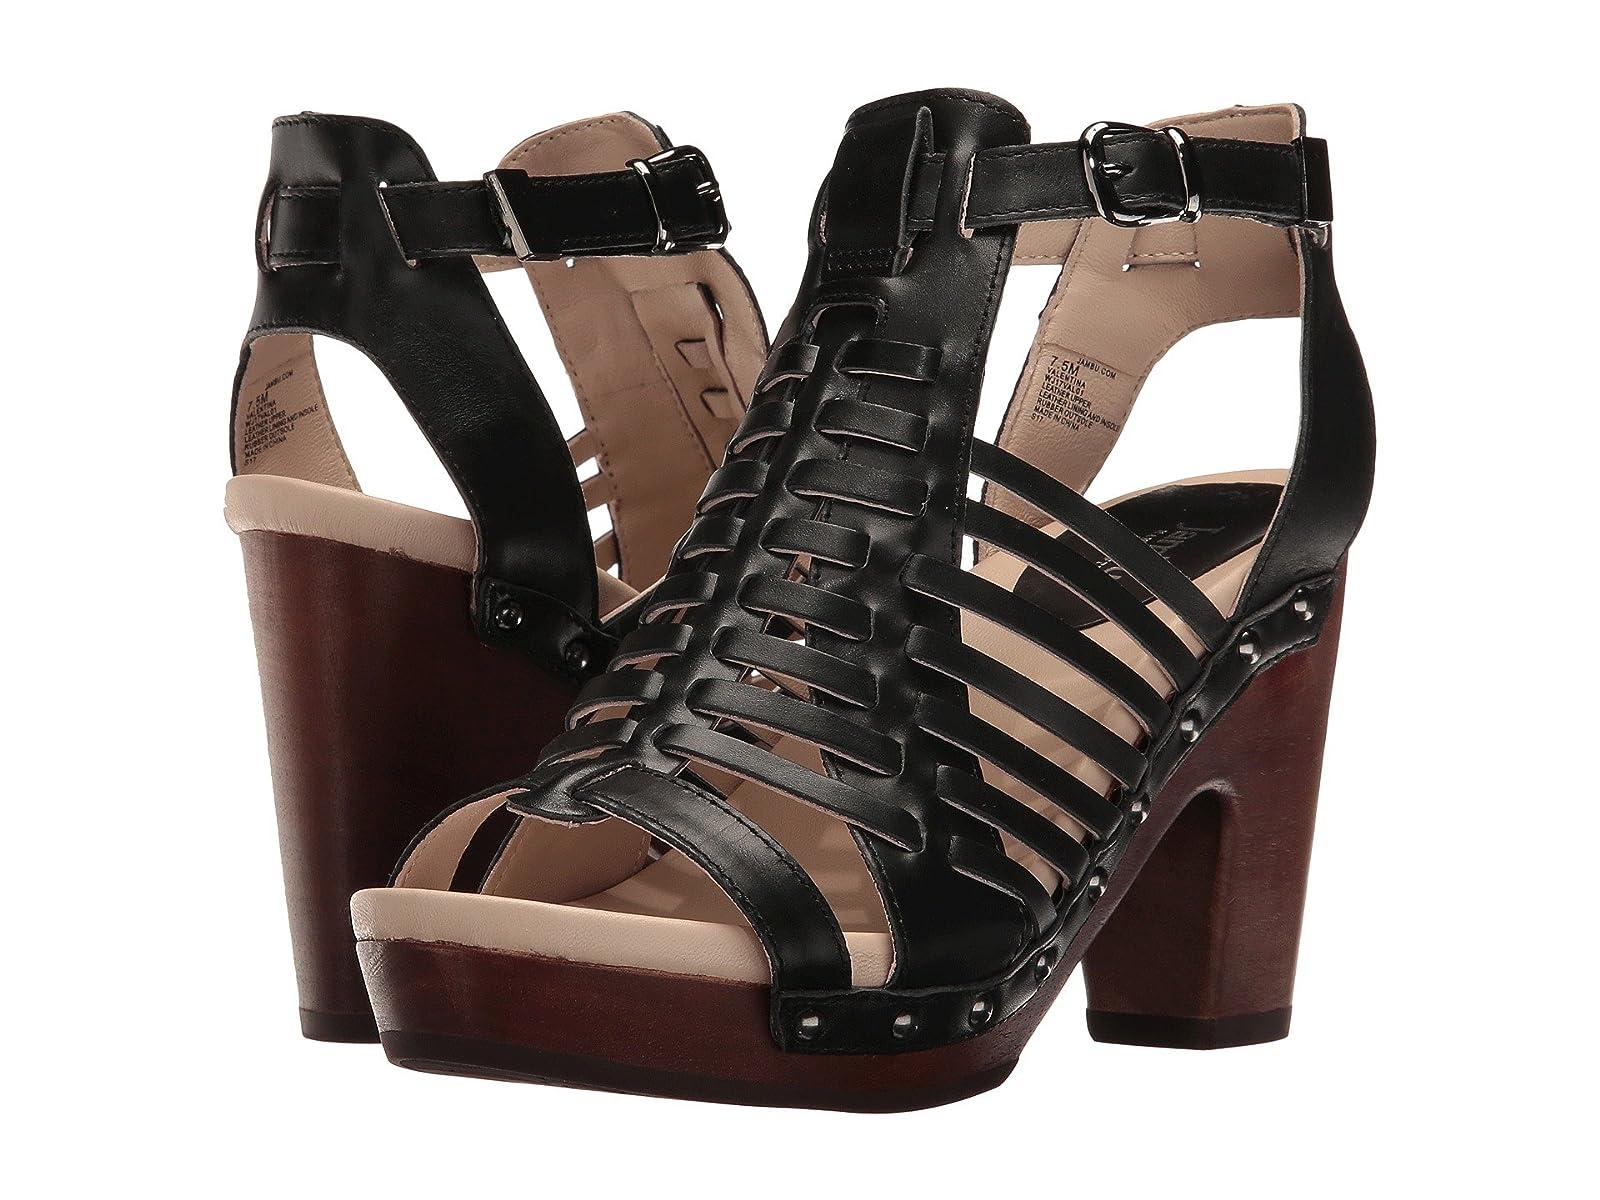 Jambu ValentinaCheap and distinctive eye-catching shoes